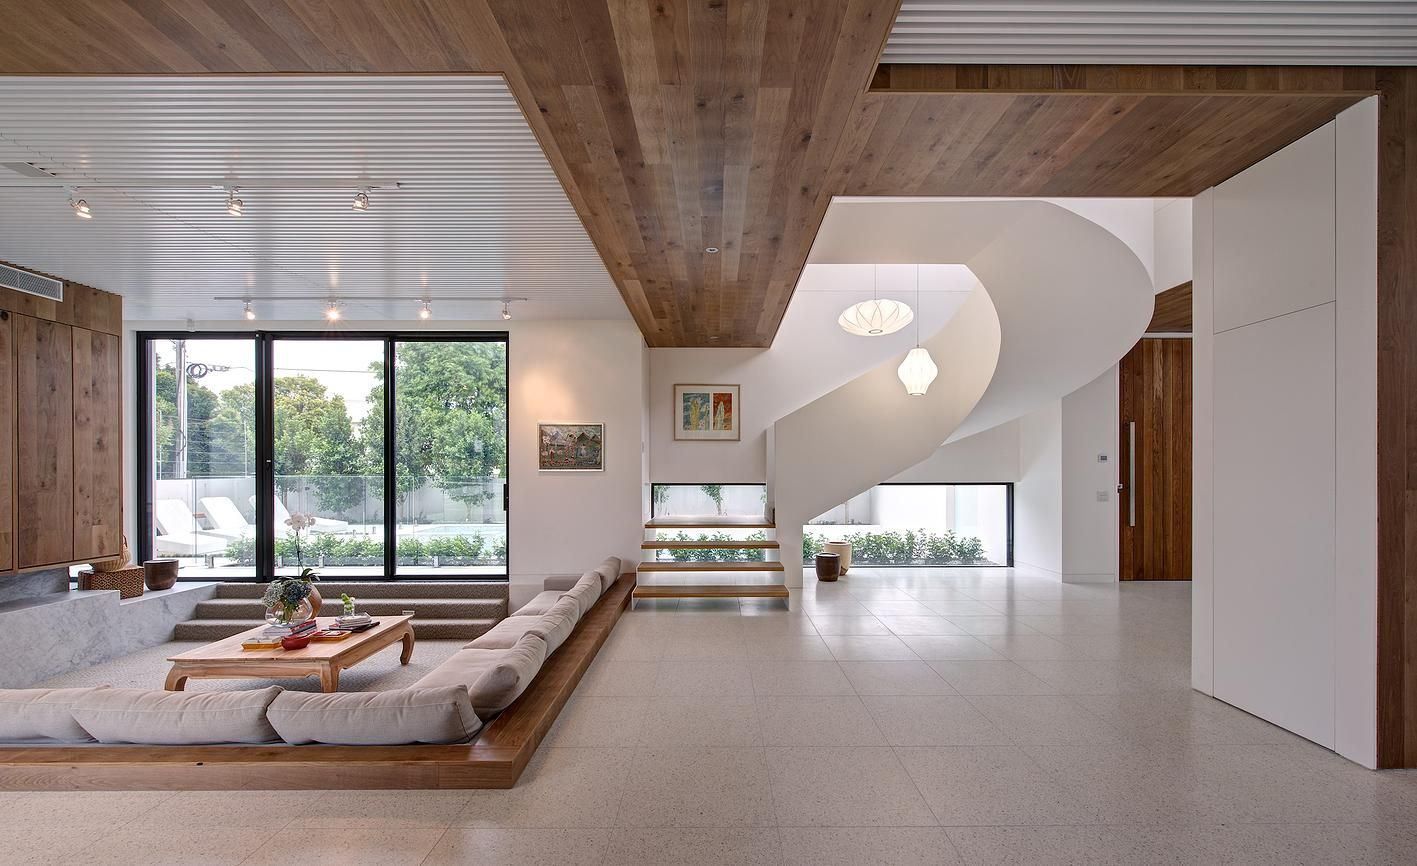 Modern And Warm Mansion Interior Inspiring Serenity In Australia By Georgia Ezra